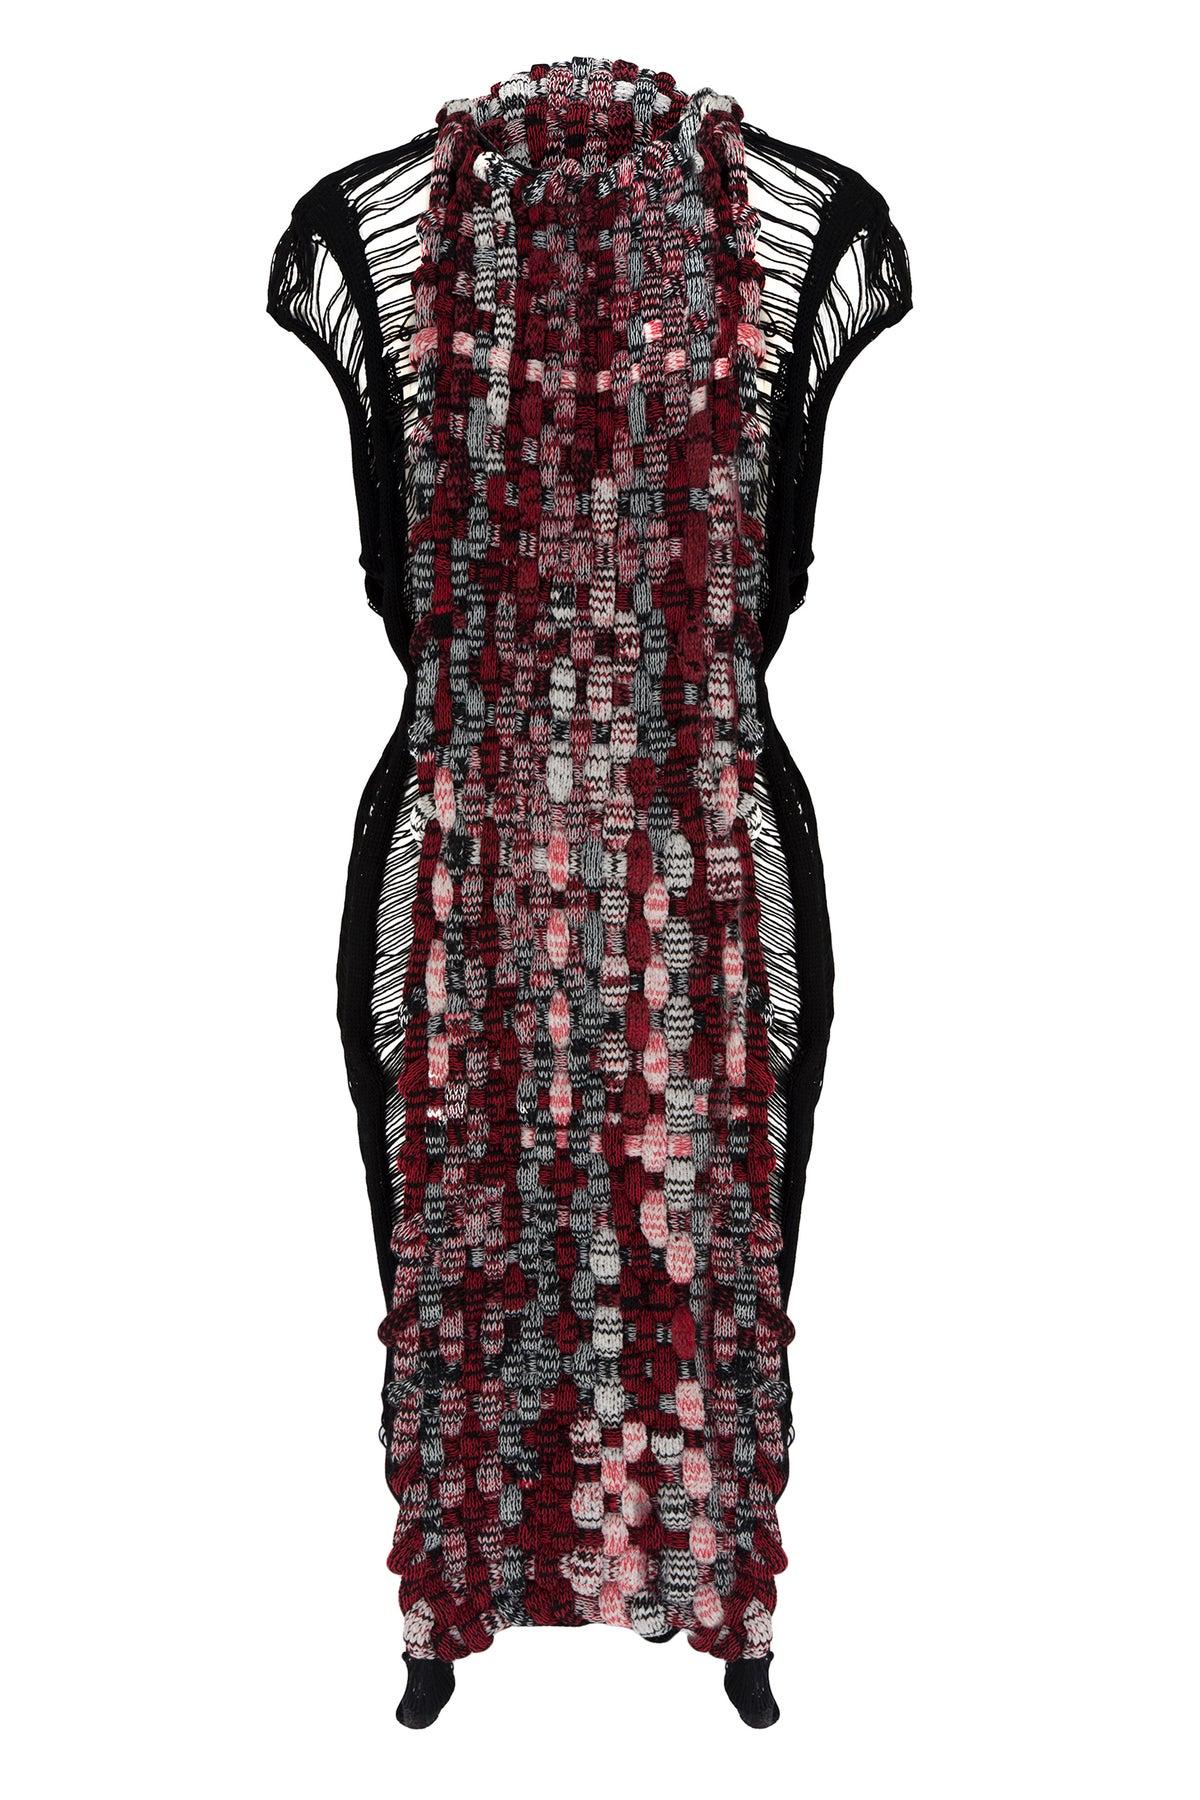 Image of Tubular Woven Knit Dress